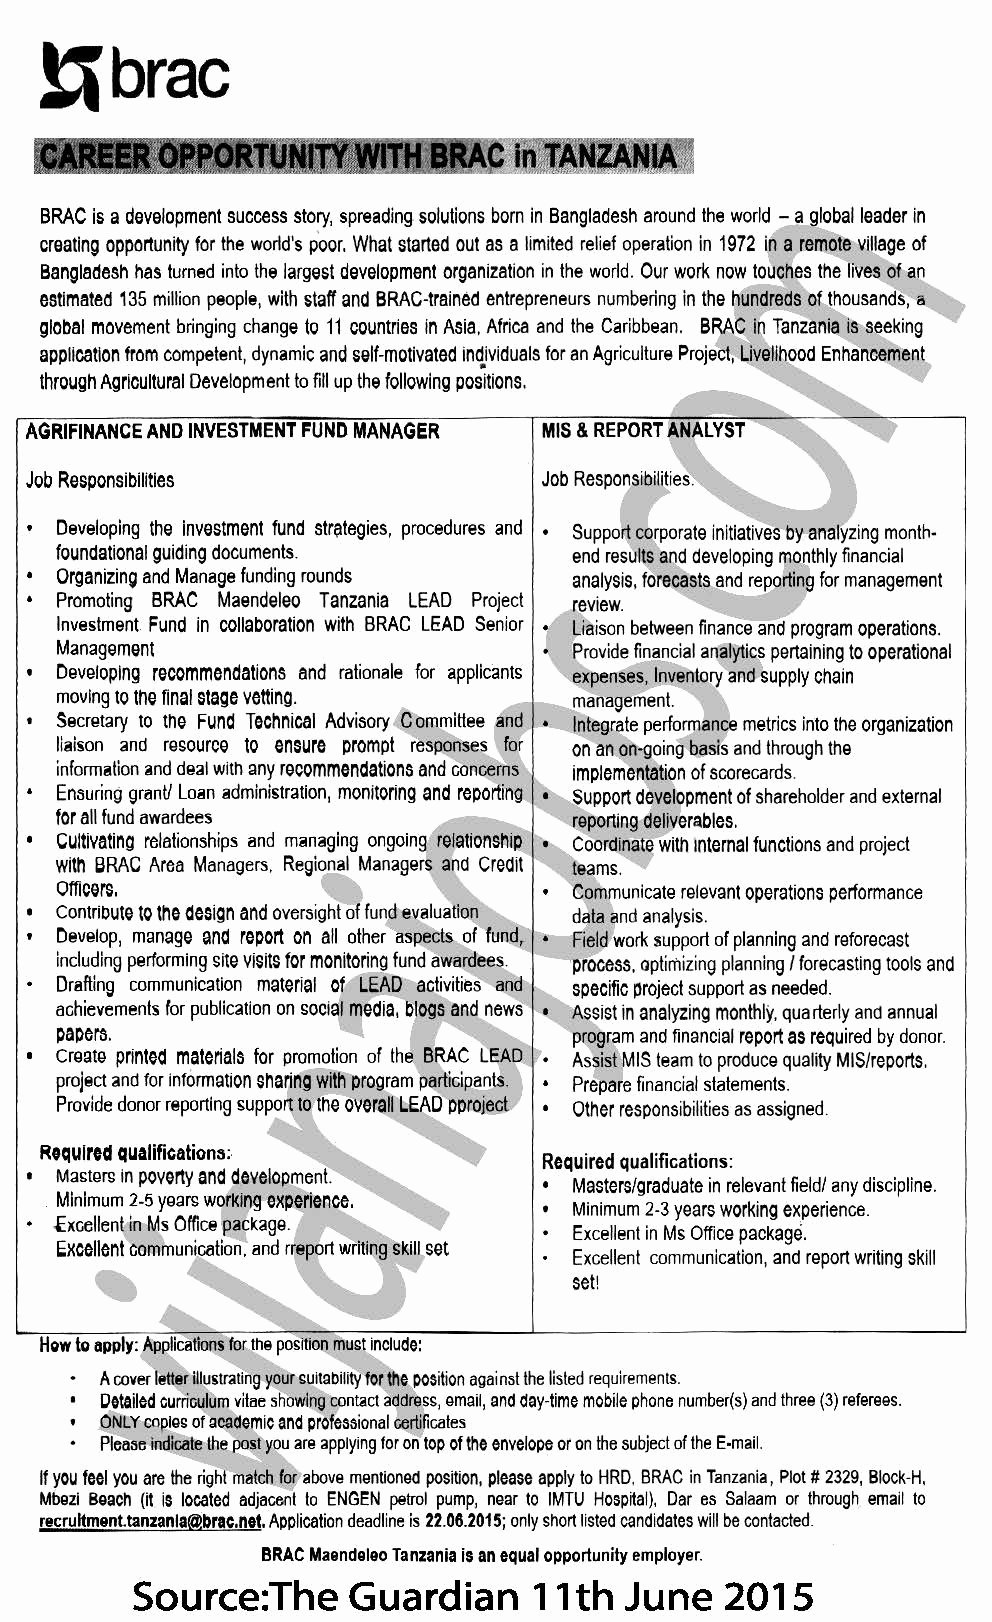 Mis Job Description Unique Agrifinance and Investment Fund Manager Mis & Report